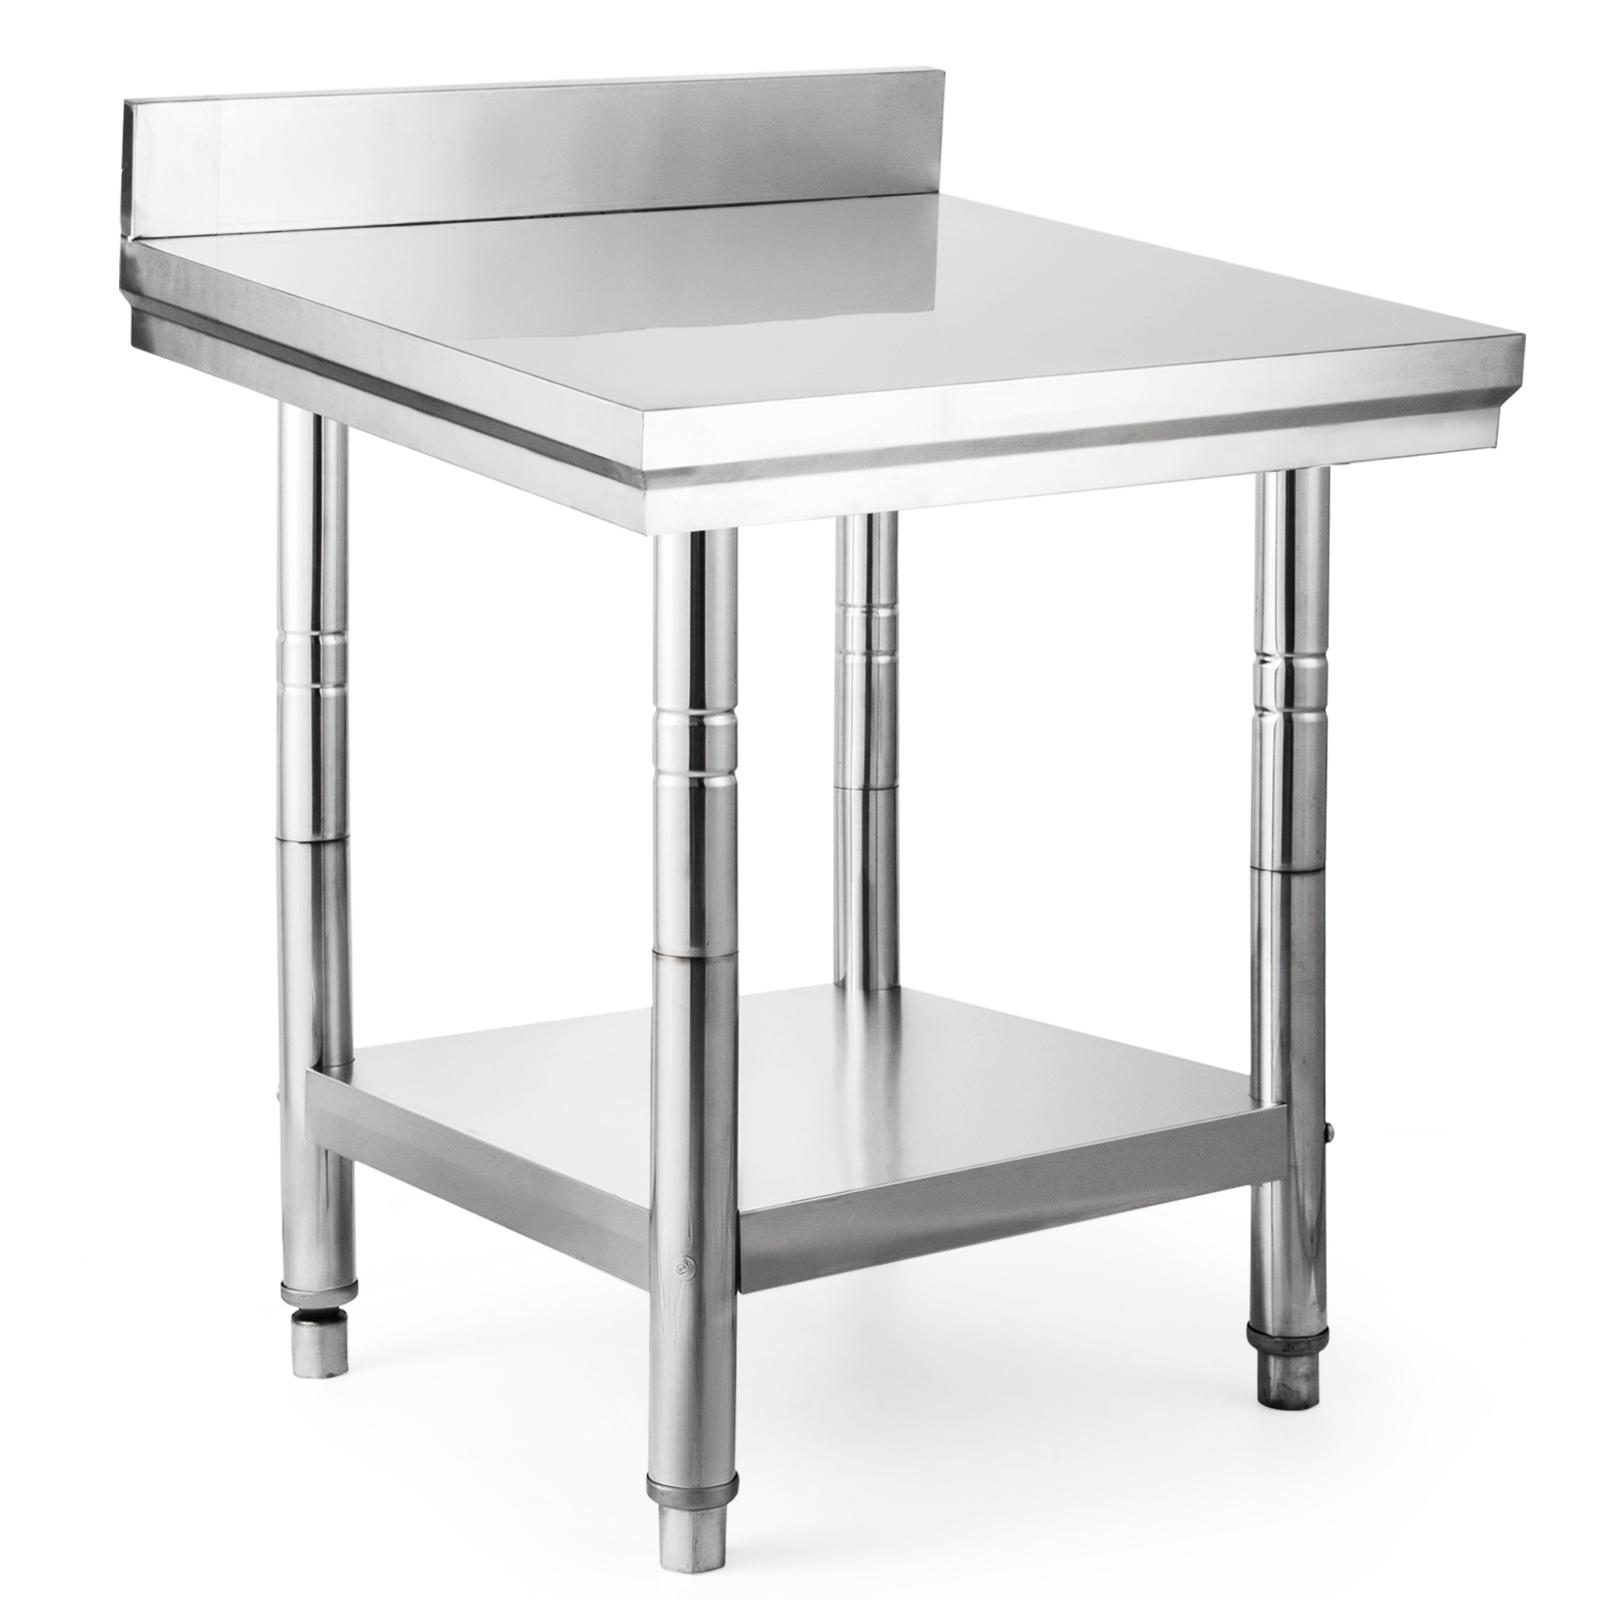 24 x 24 stainless steel kitchen work table commercial kitchen restaurant 2472 848837015619 ebay. Black Bedroom Furniture Sets. Home Design Ideas